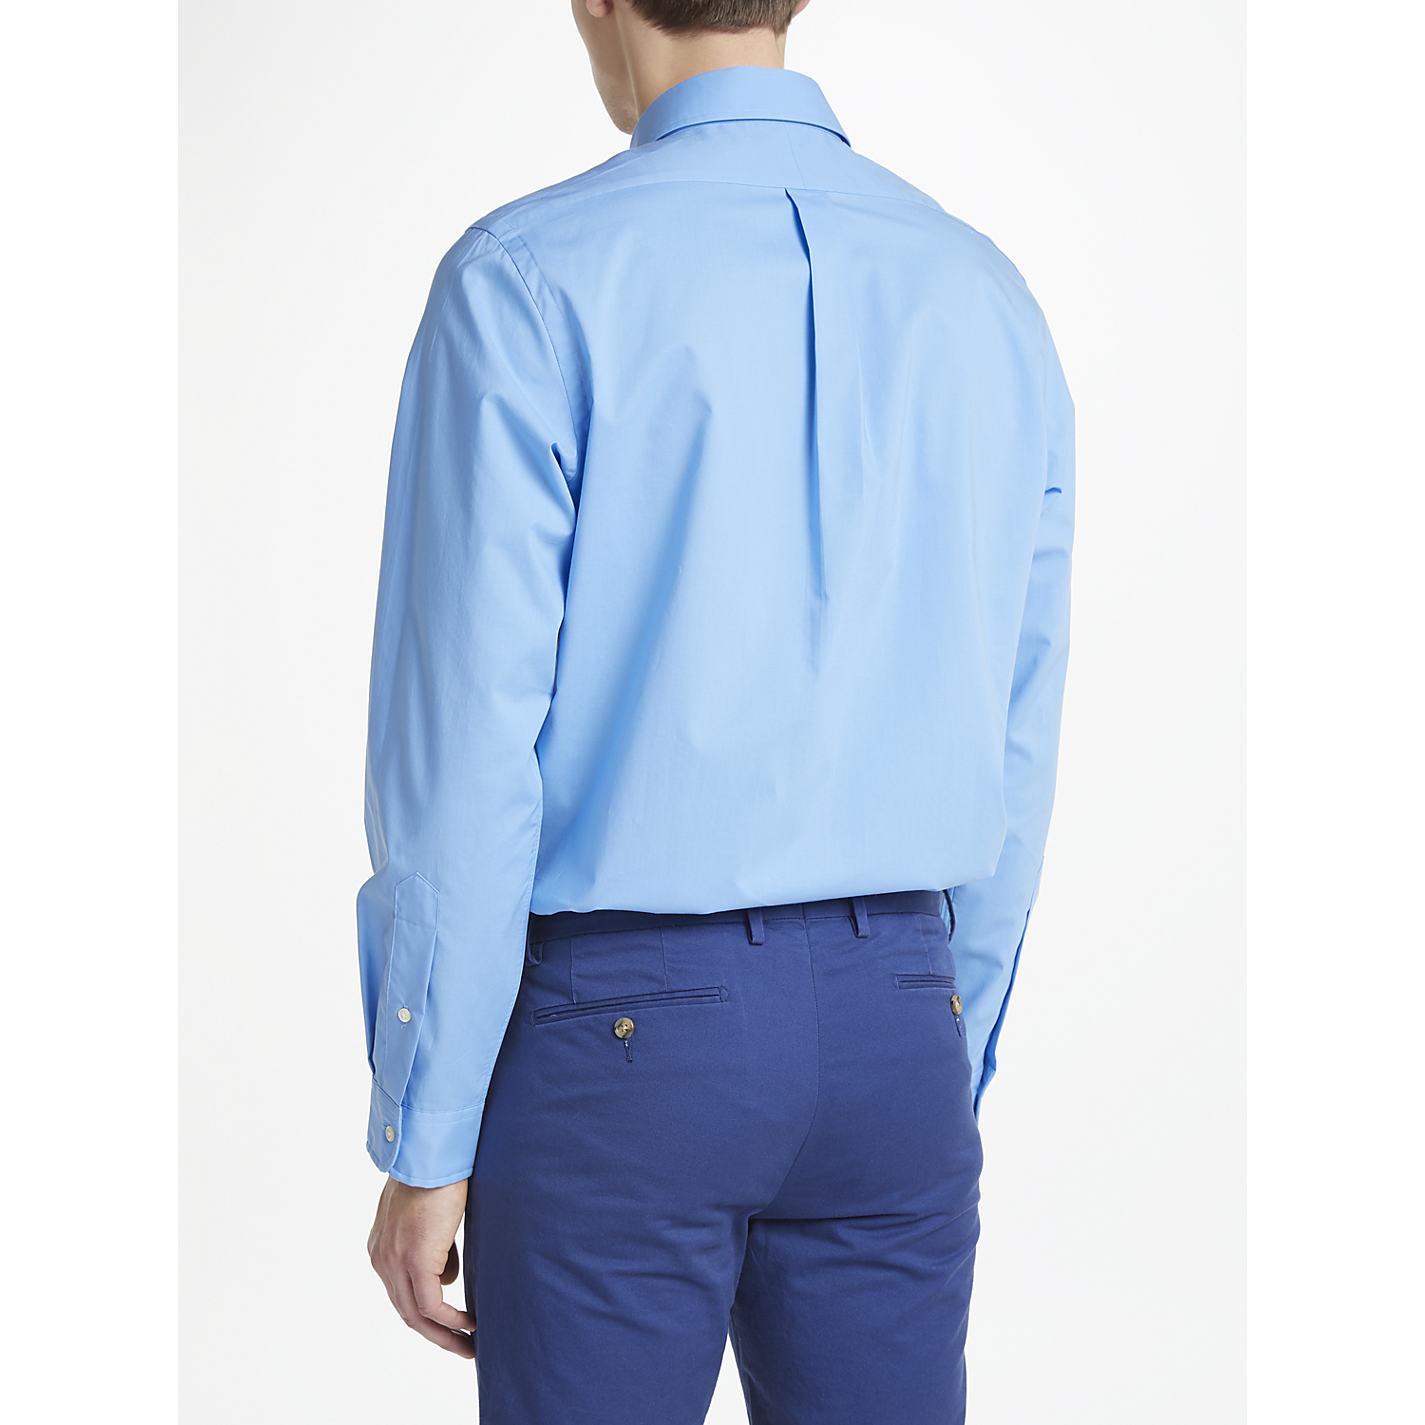 Buy Polo Ralph Lauren Slim Cotton Poplin Shirt John Lewis # Muebles Ralph Lauren Espana